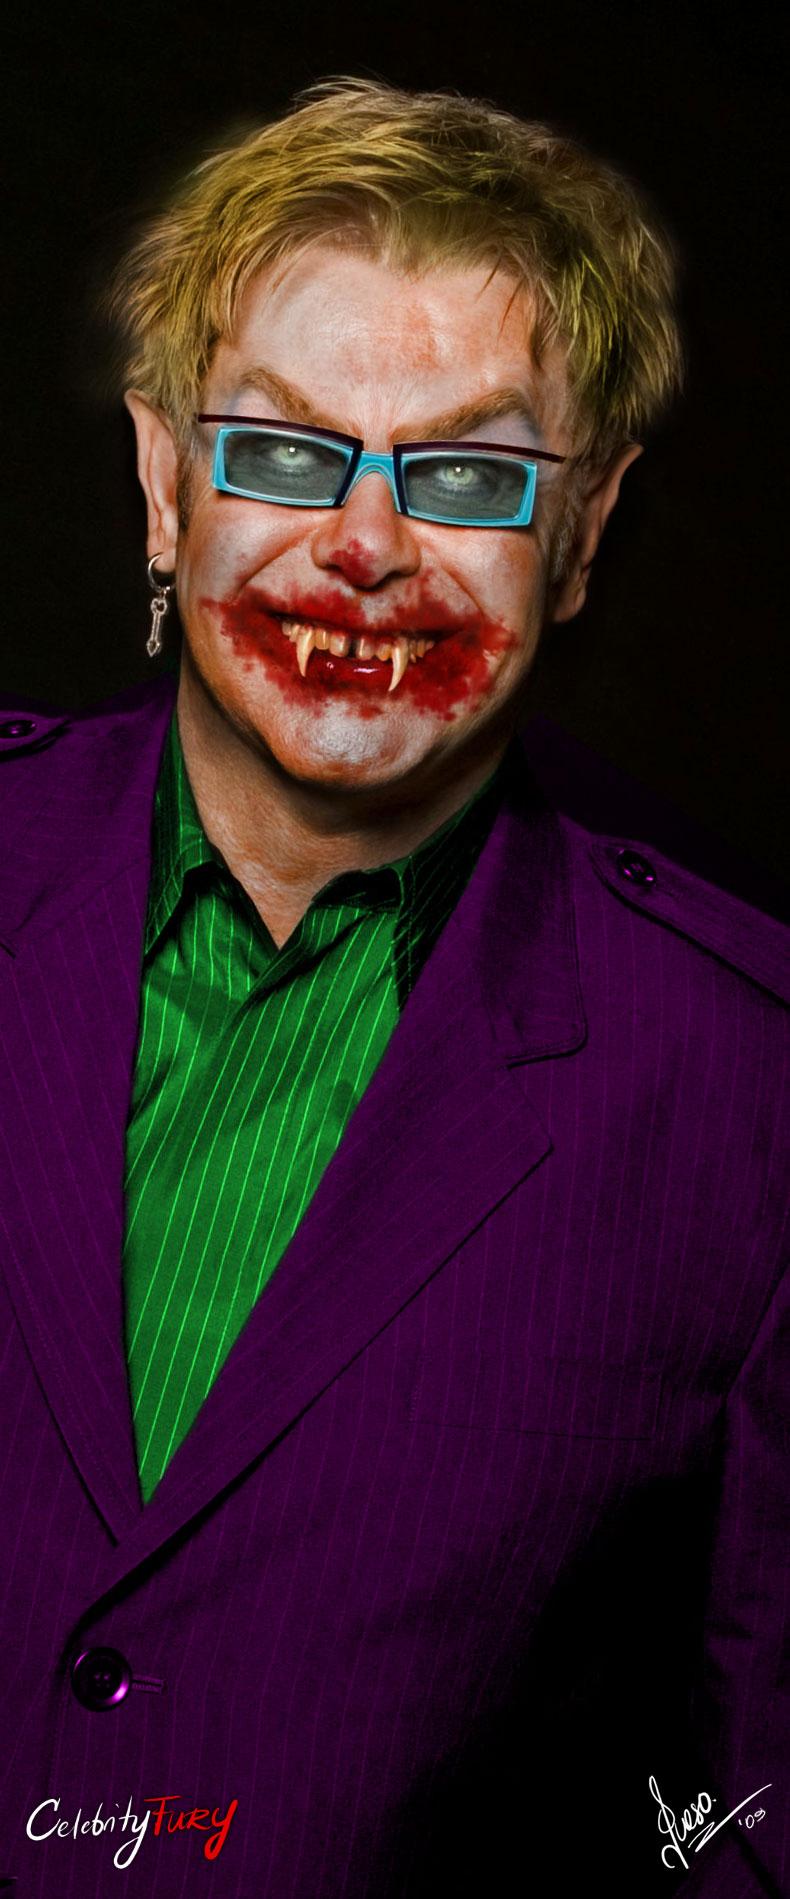 elton_john Elton John Elton John elton john